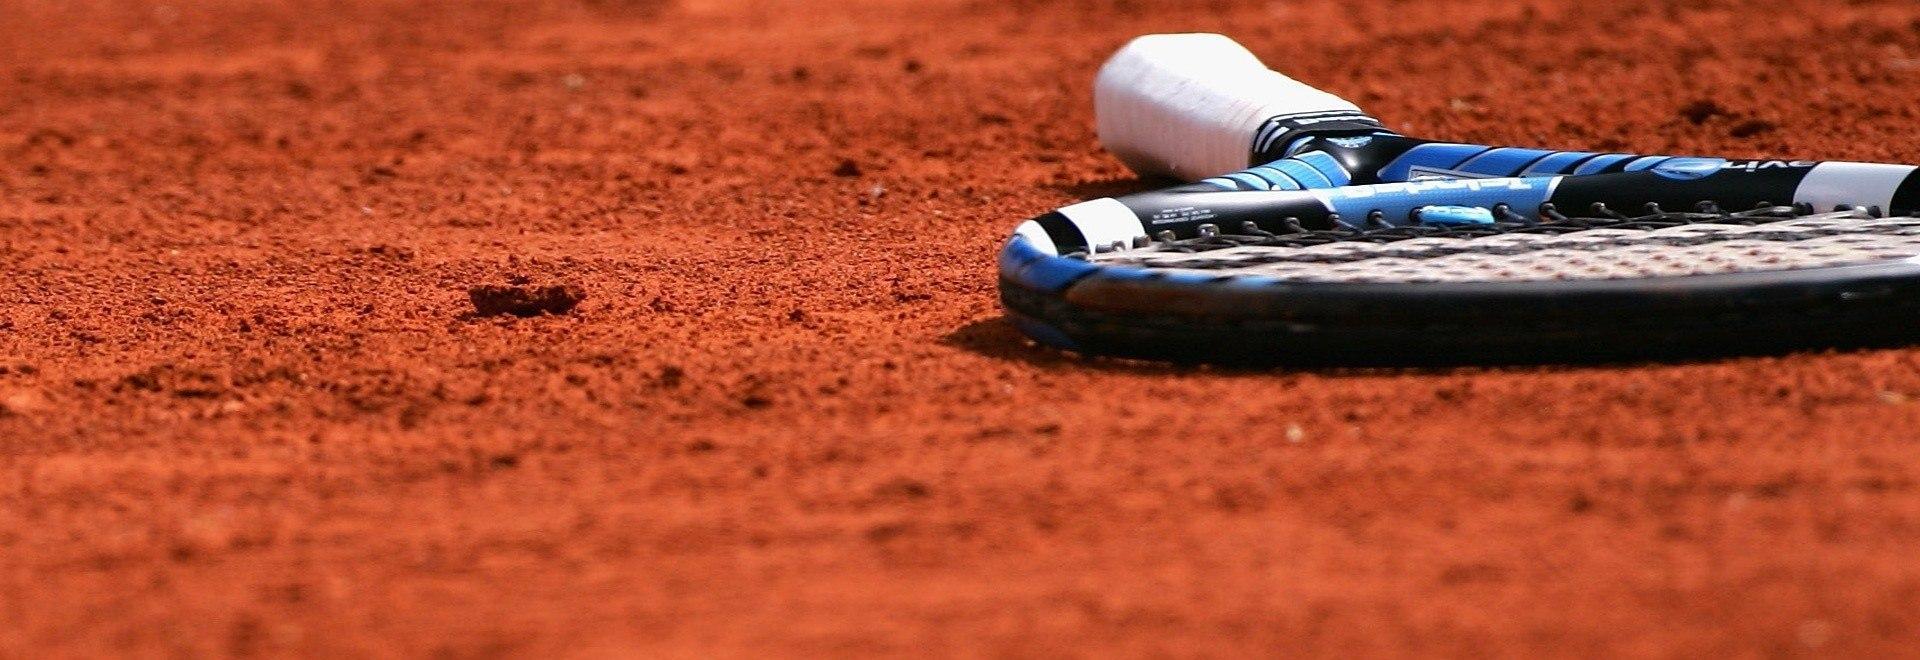 ATP World Tour Masters 1000 HL 2017 - Stag. 2017 - Madrid